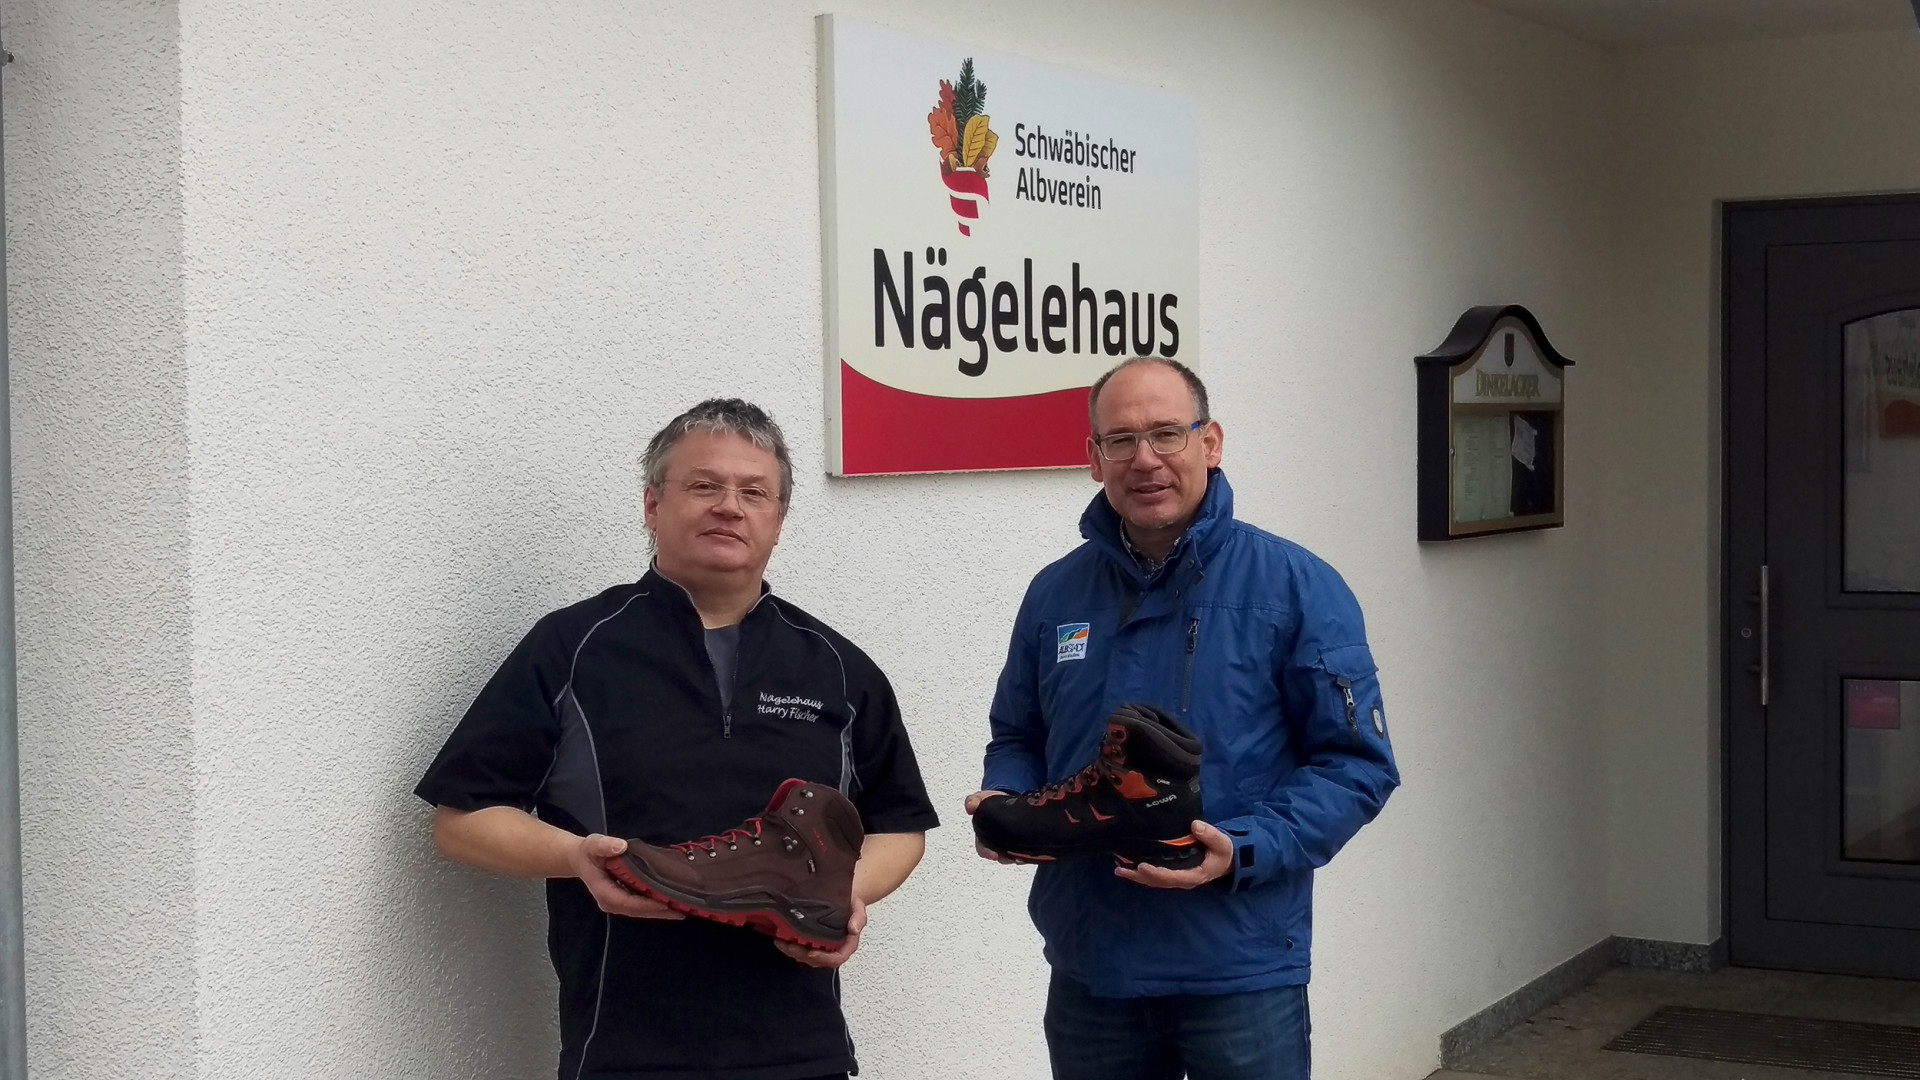 nagelehaus-imag0296